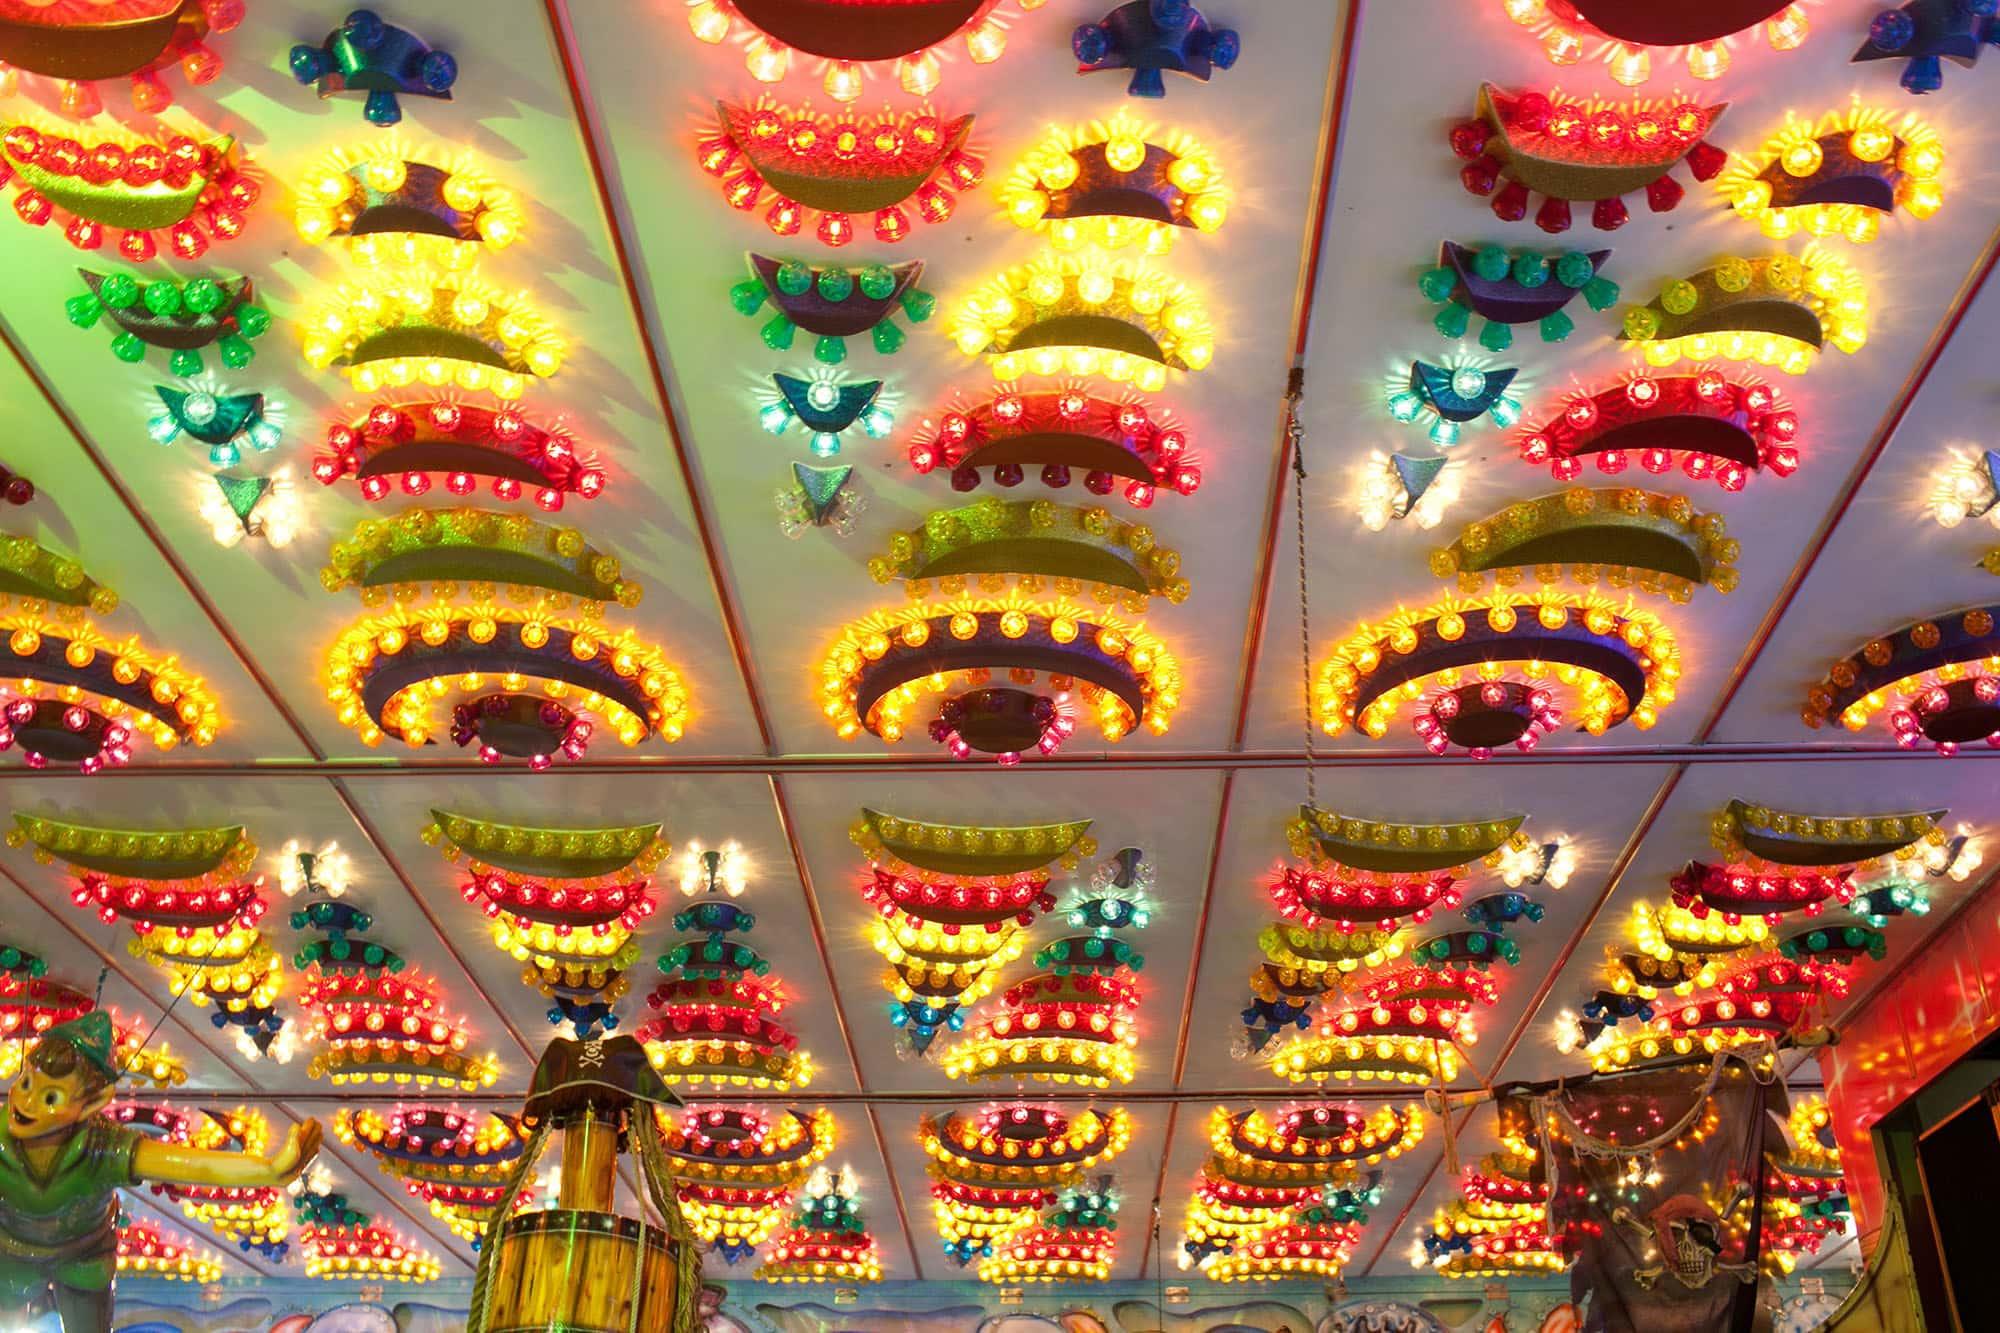 Carnival in Brussels, Belgium